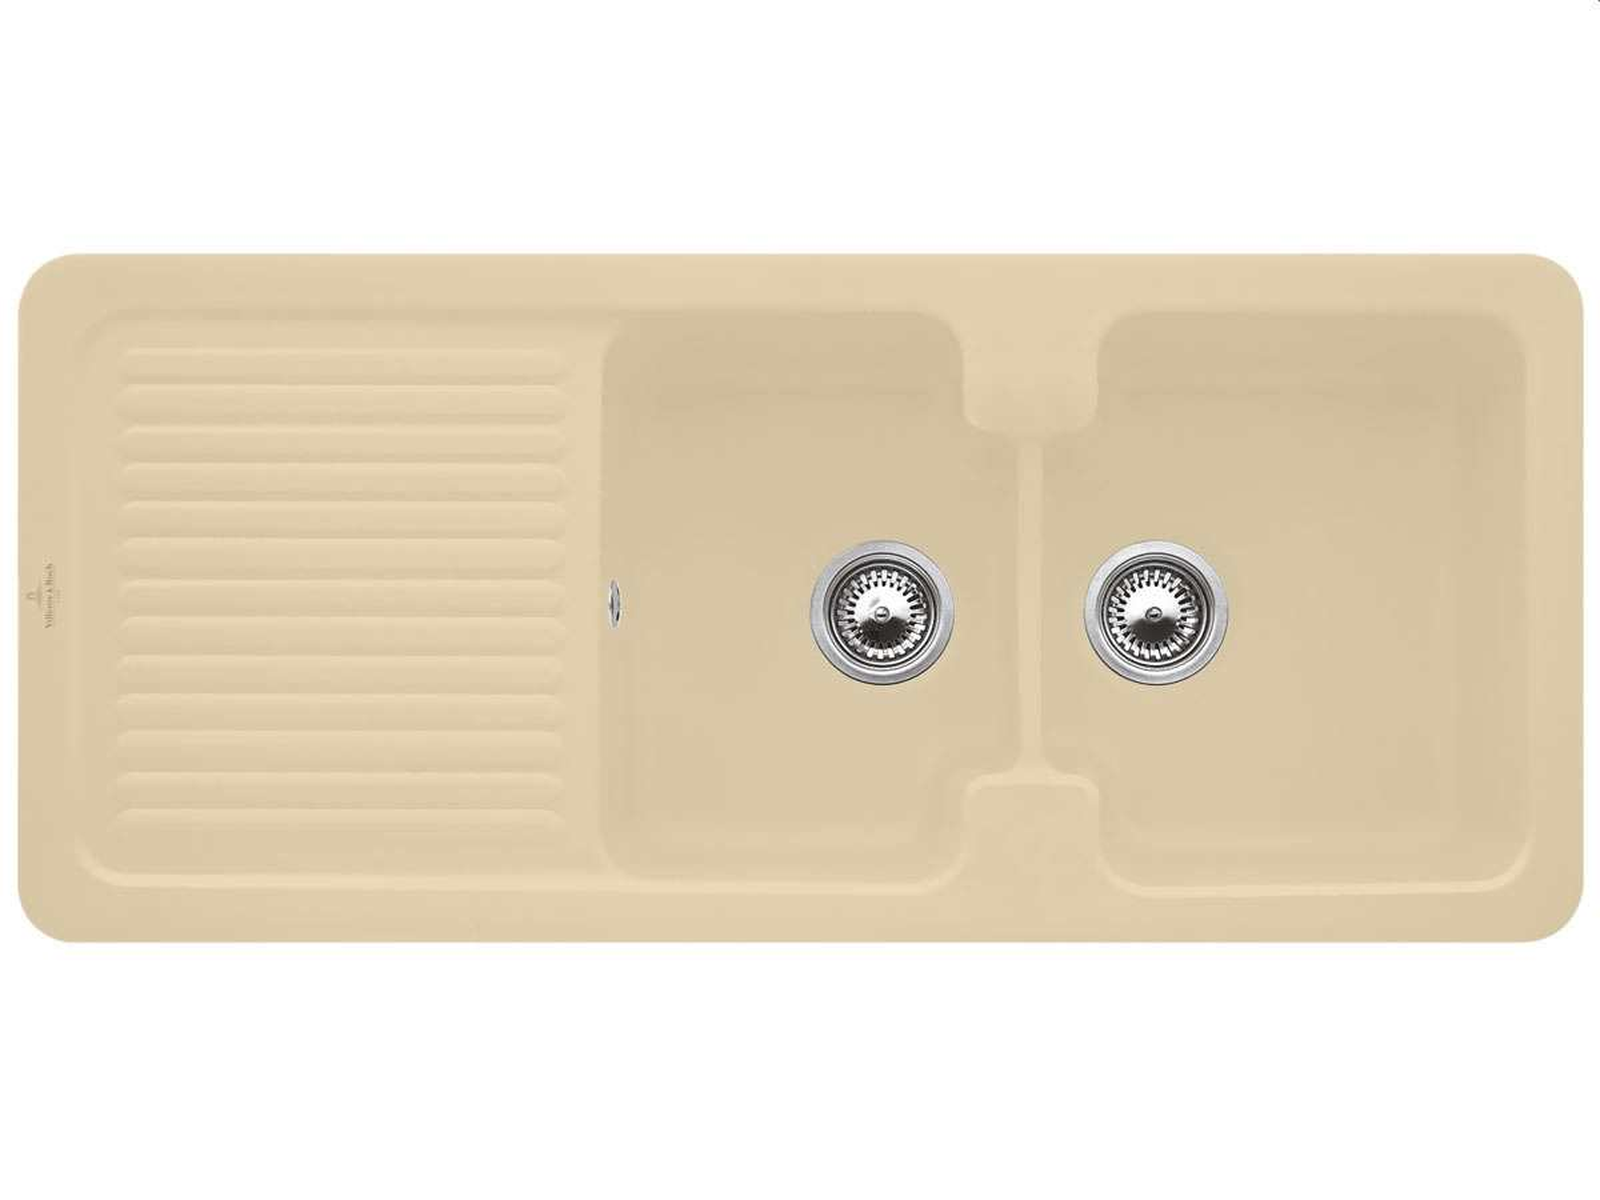 villeroy boch condor 80 sand 6746 01 i5 keramiksp le handbet tigung. Black Bedroom Furniture Sets. Home Design Ideas